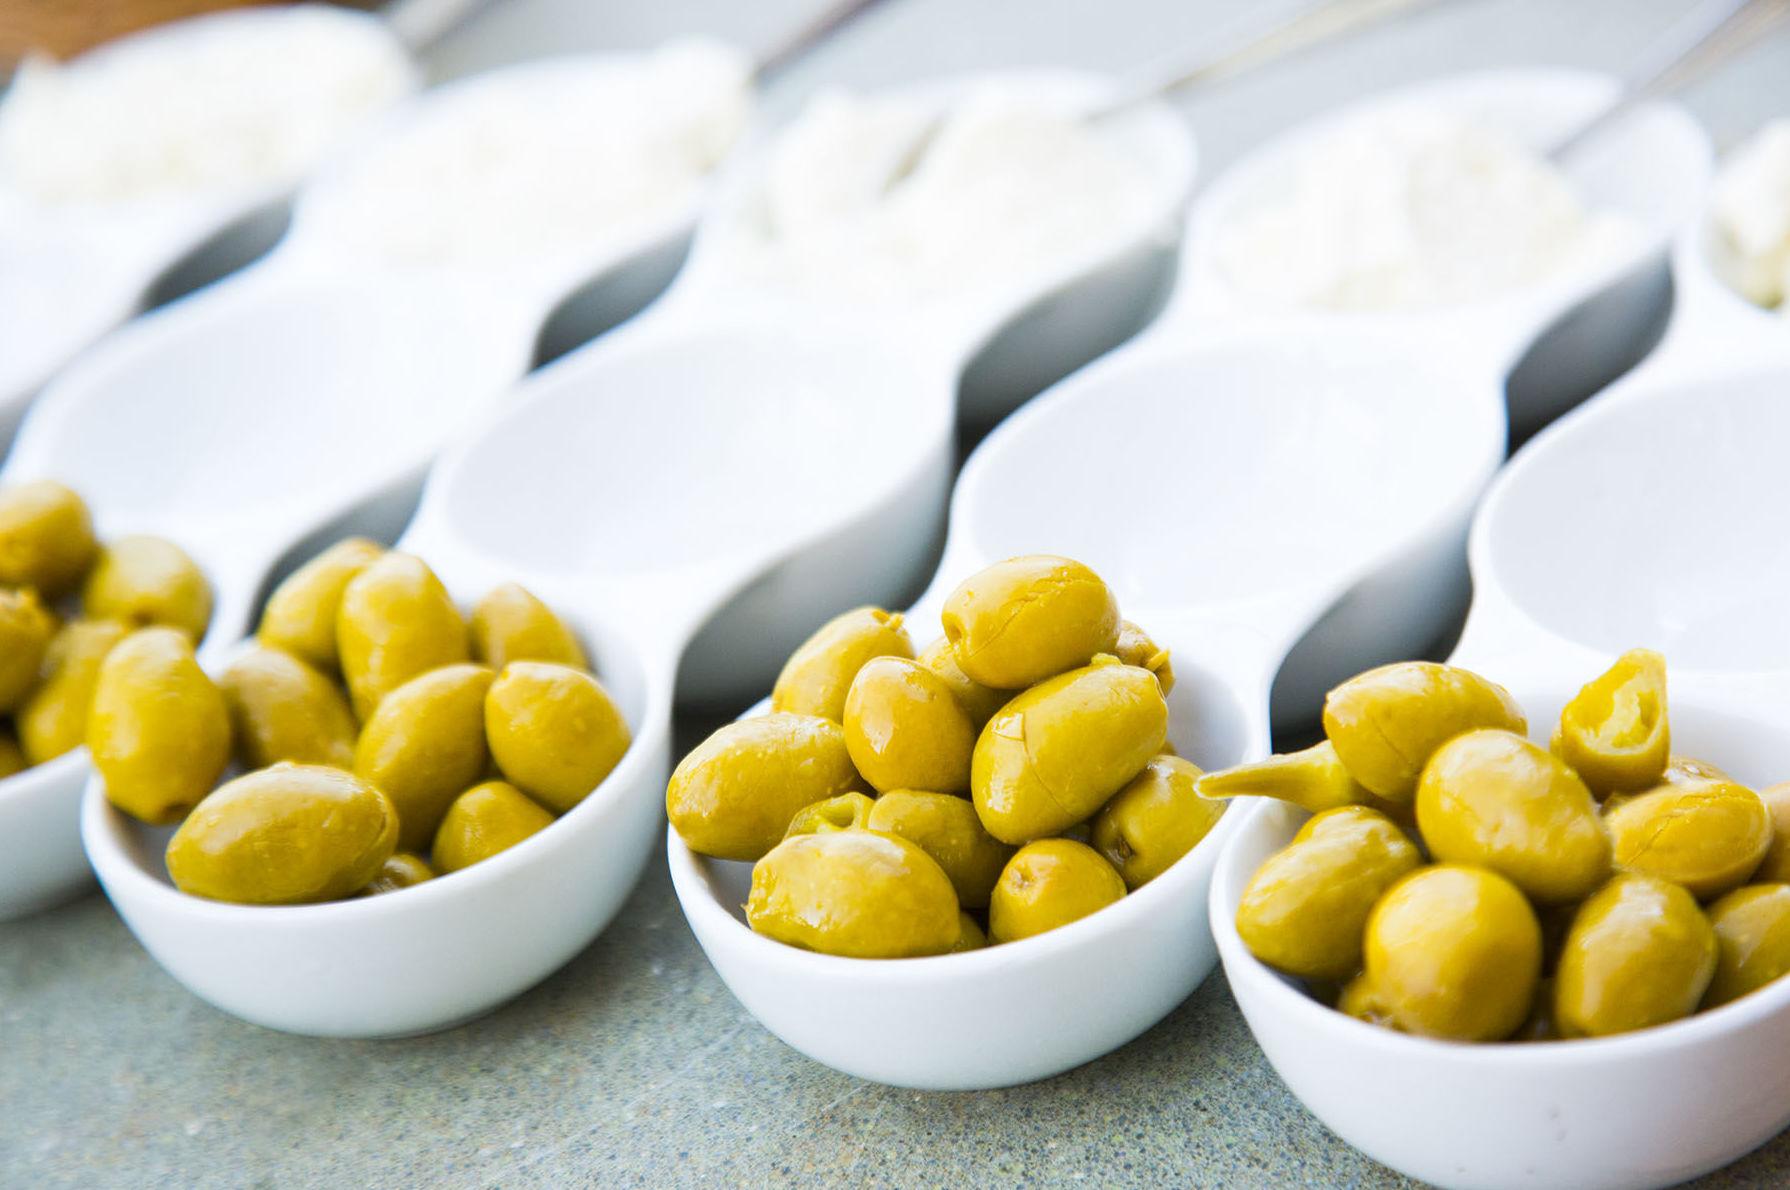 Aceitunas mallorquinas, exquisito manjar Mediterráneo